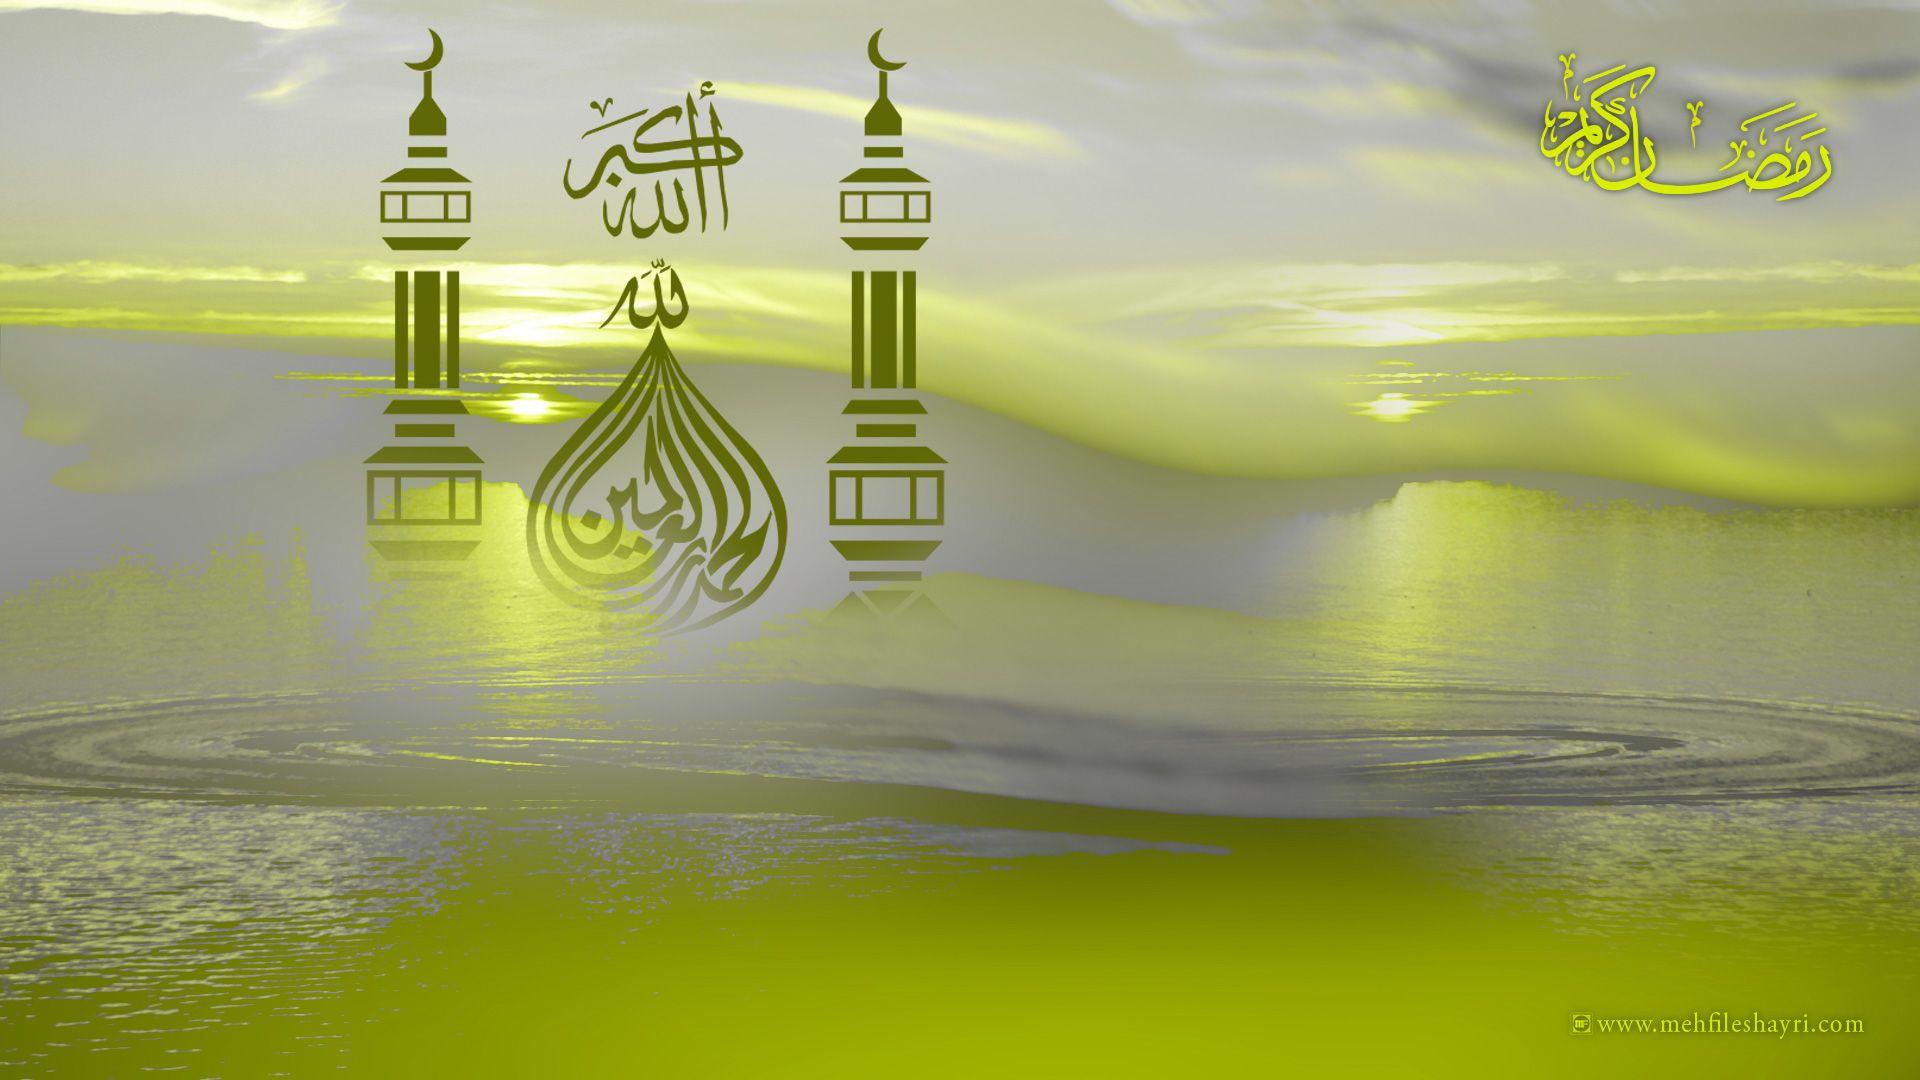 Mehfileshayri.com - Ramadan Kareem Wallpaper | Click image to view ... for Ramadan Kareem Wallpapers Hd  75tgx